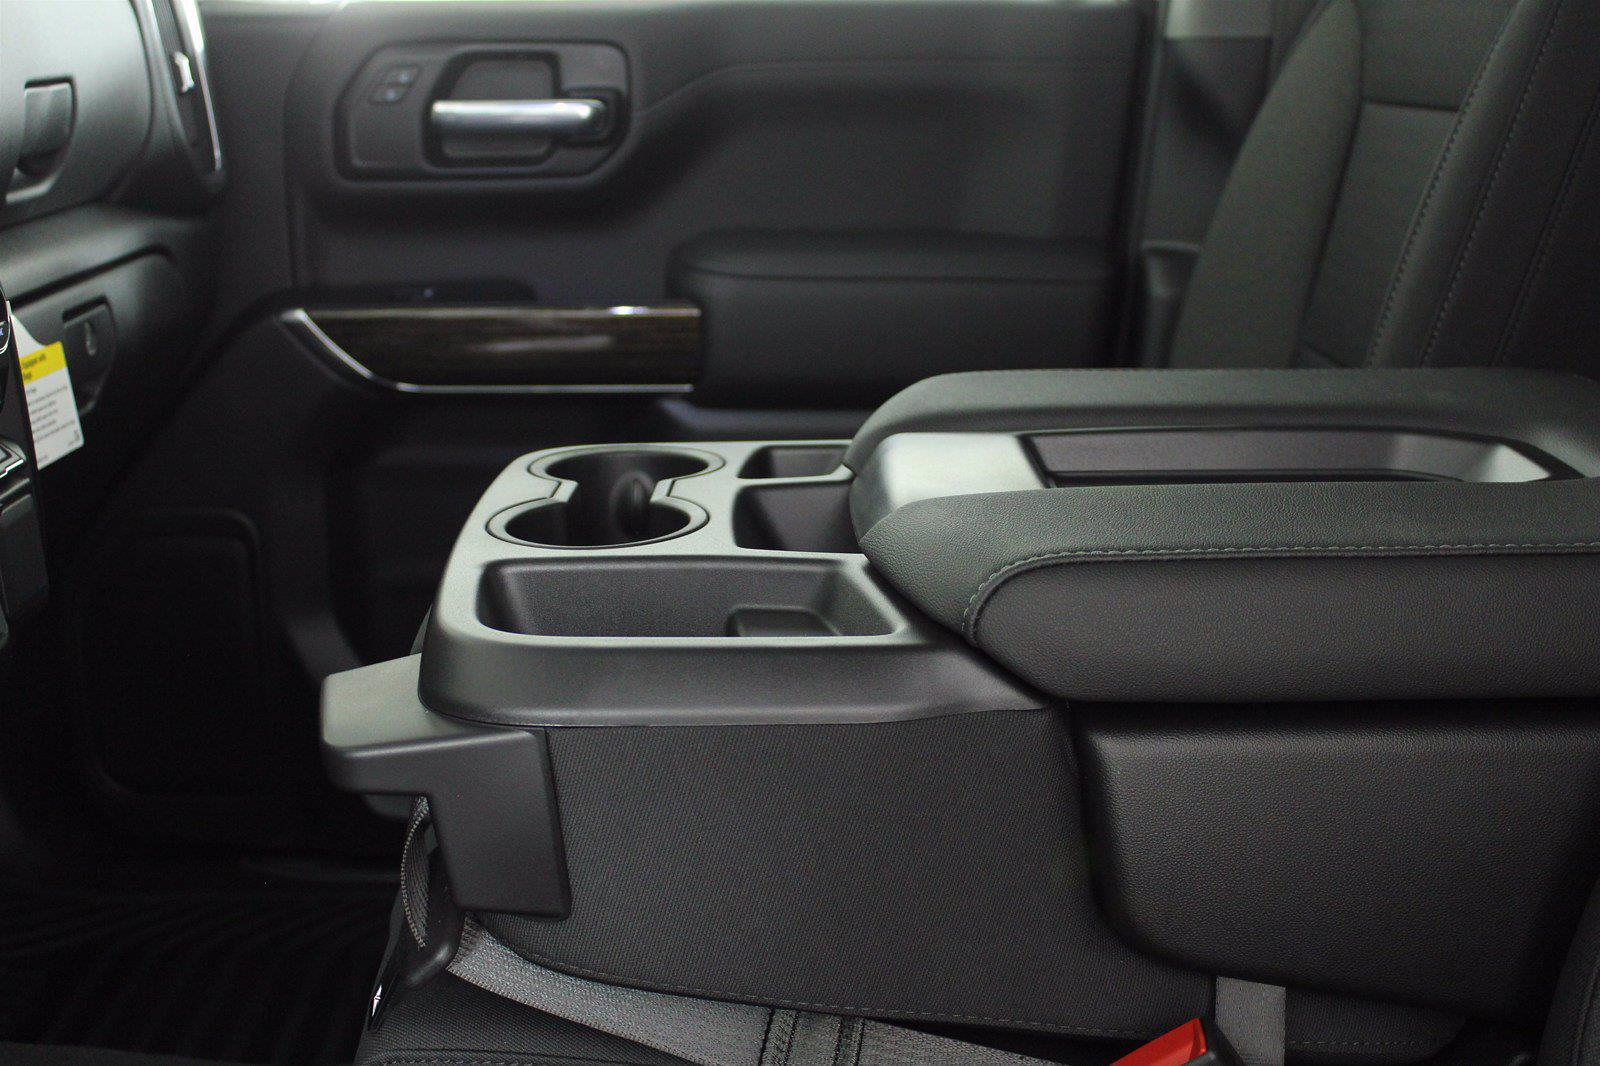 2021 Sierra 1500 Double Cab 4x4,  Pickup #D411149 - photo 13